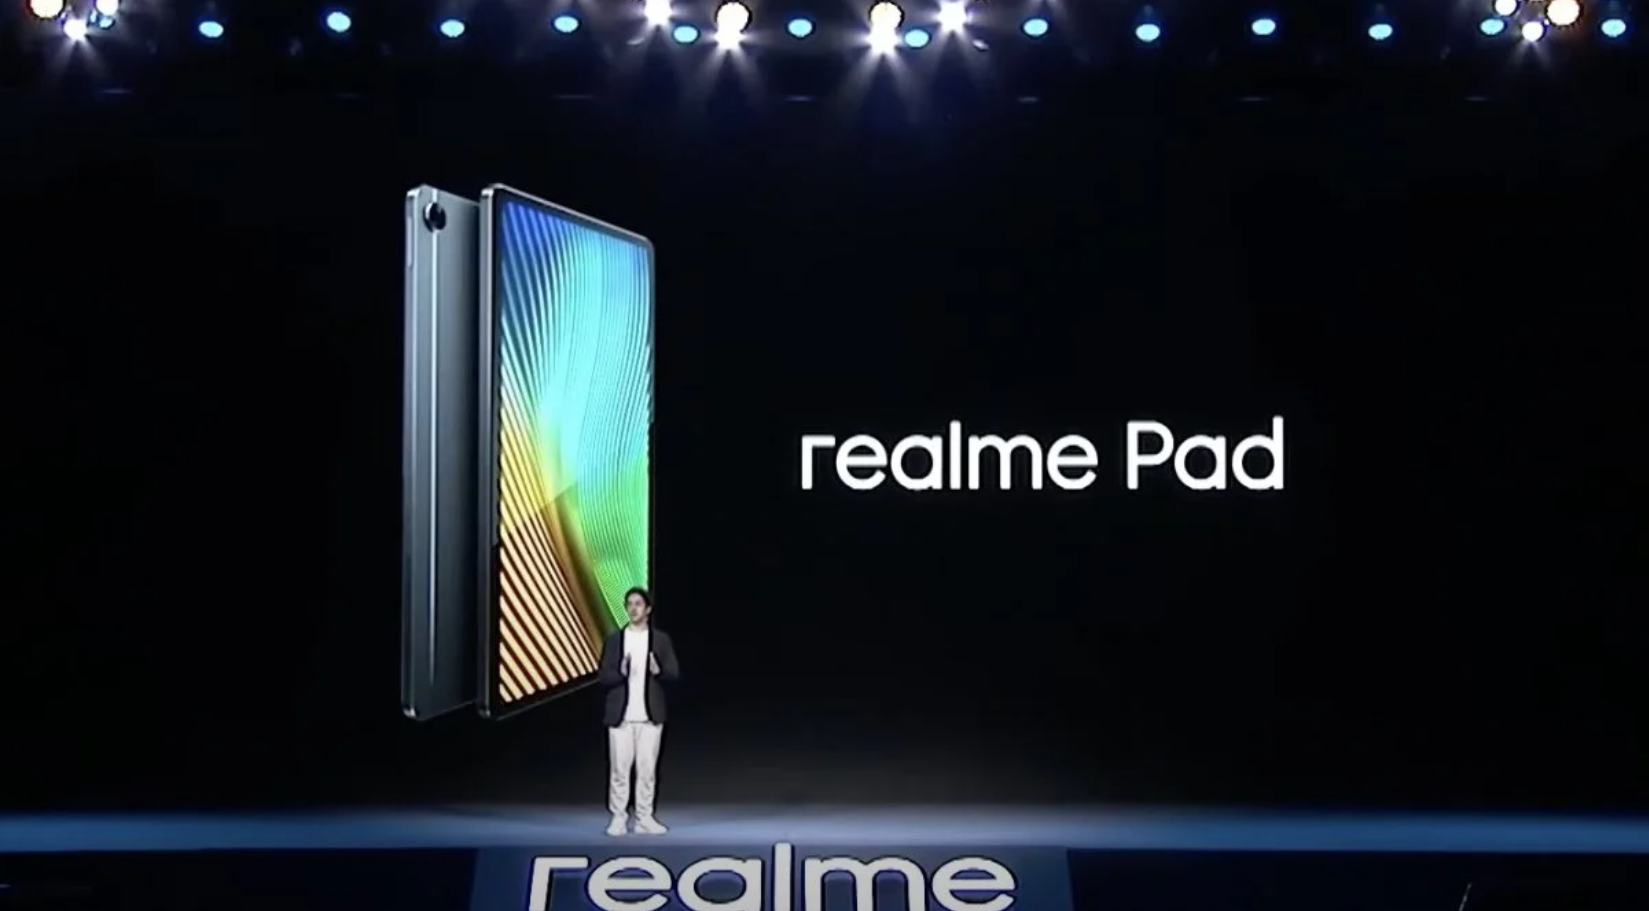 Realme Pad poderá vir com processador Mediatek Helio G80